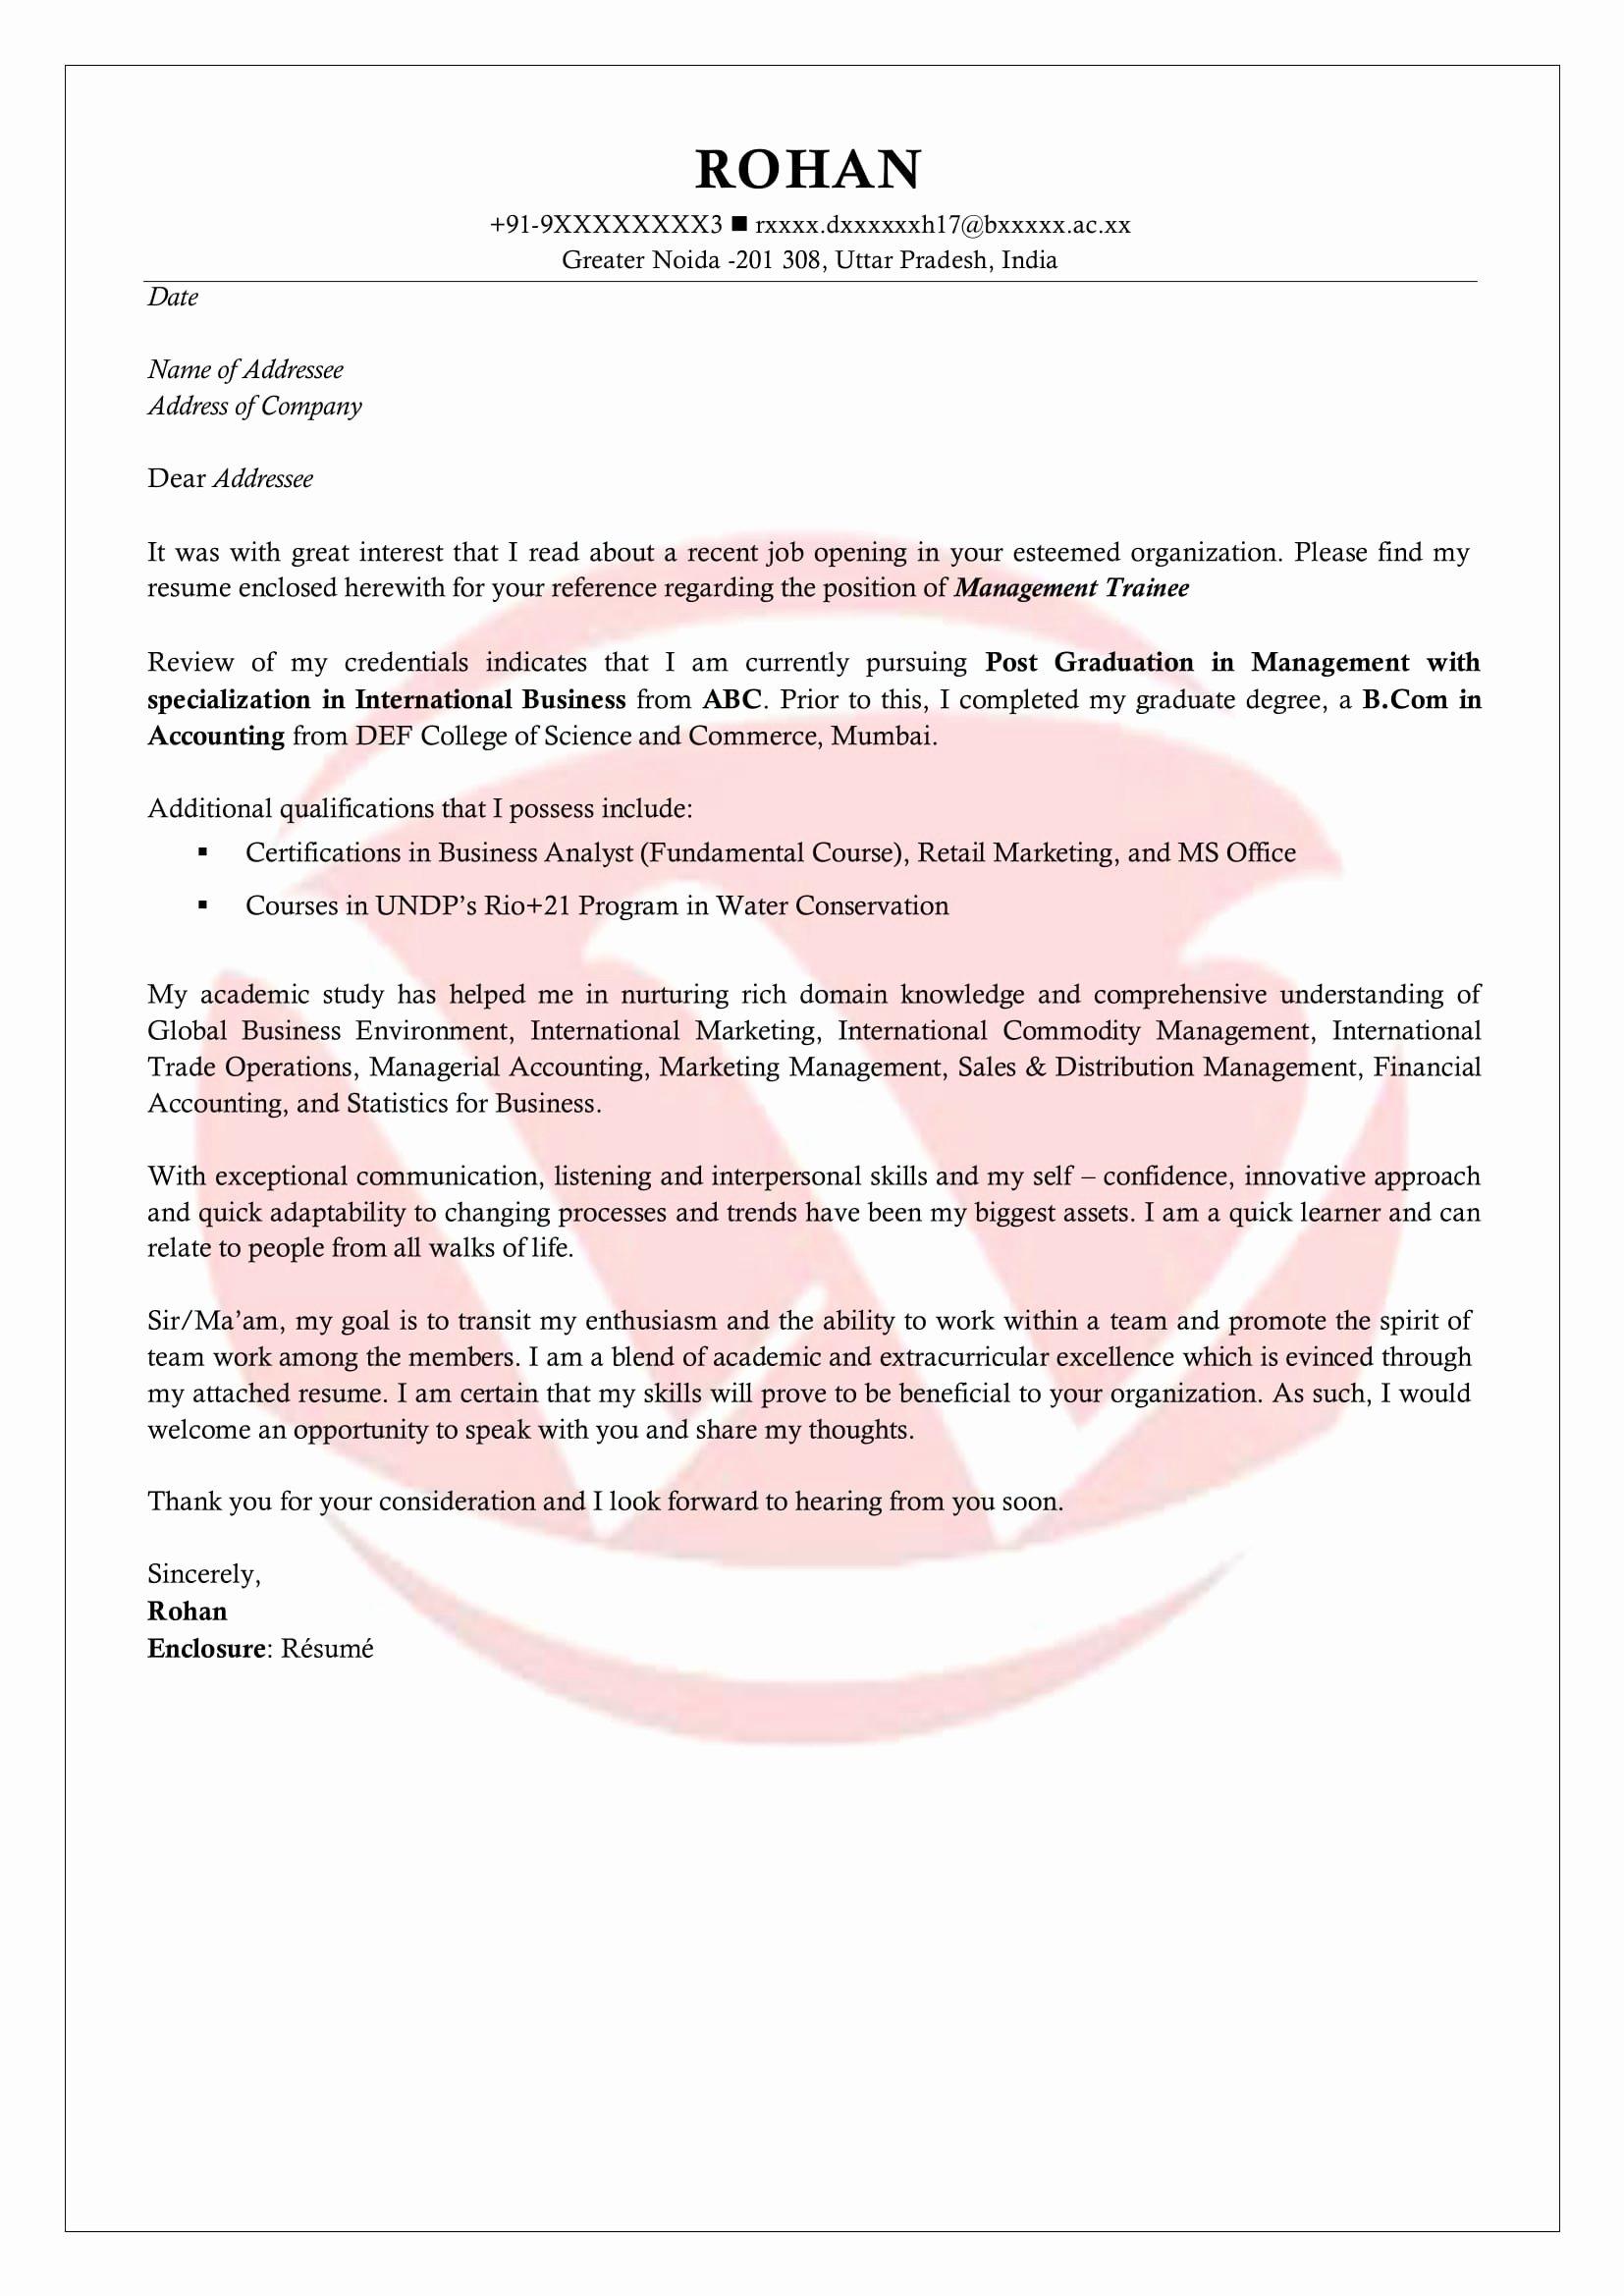 Internship Cover Letter Sample New Internship Sample Cover Letter format Download Cover